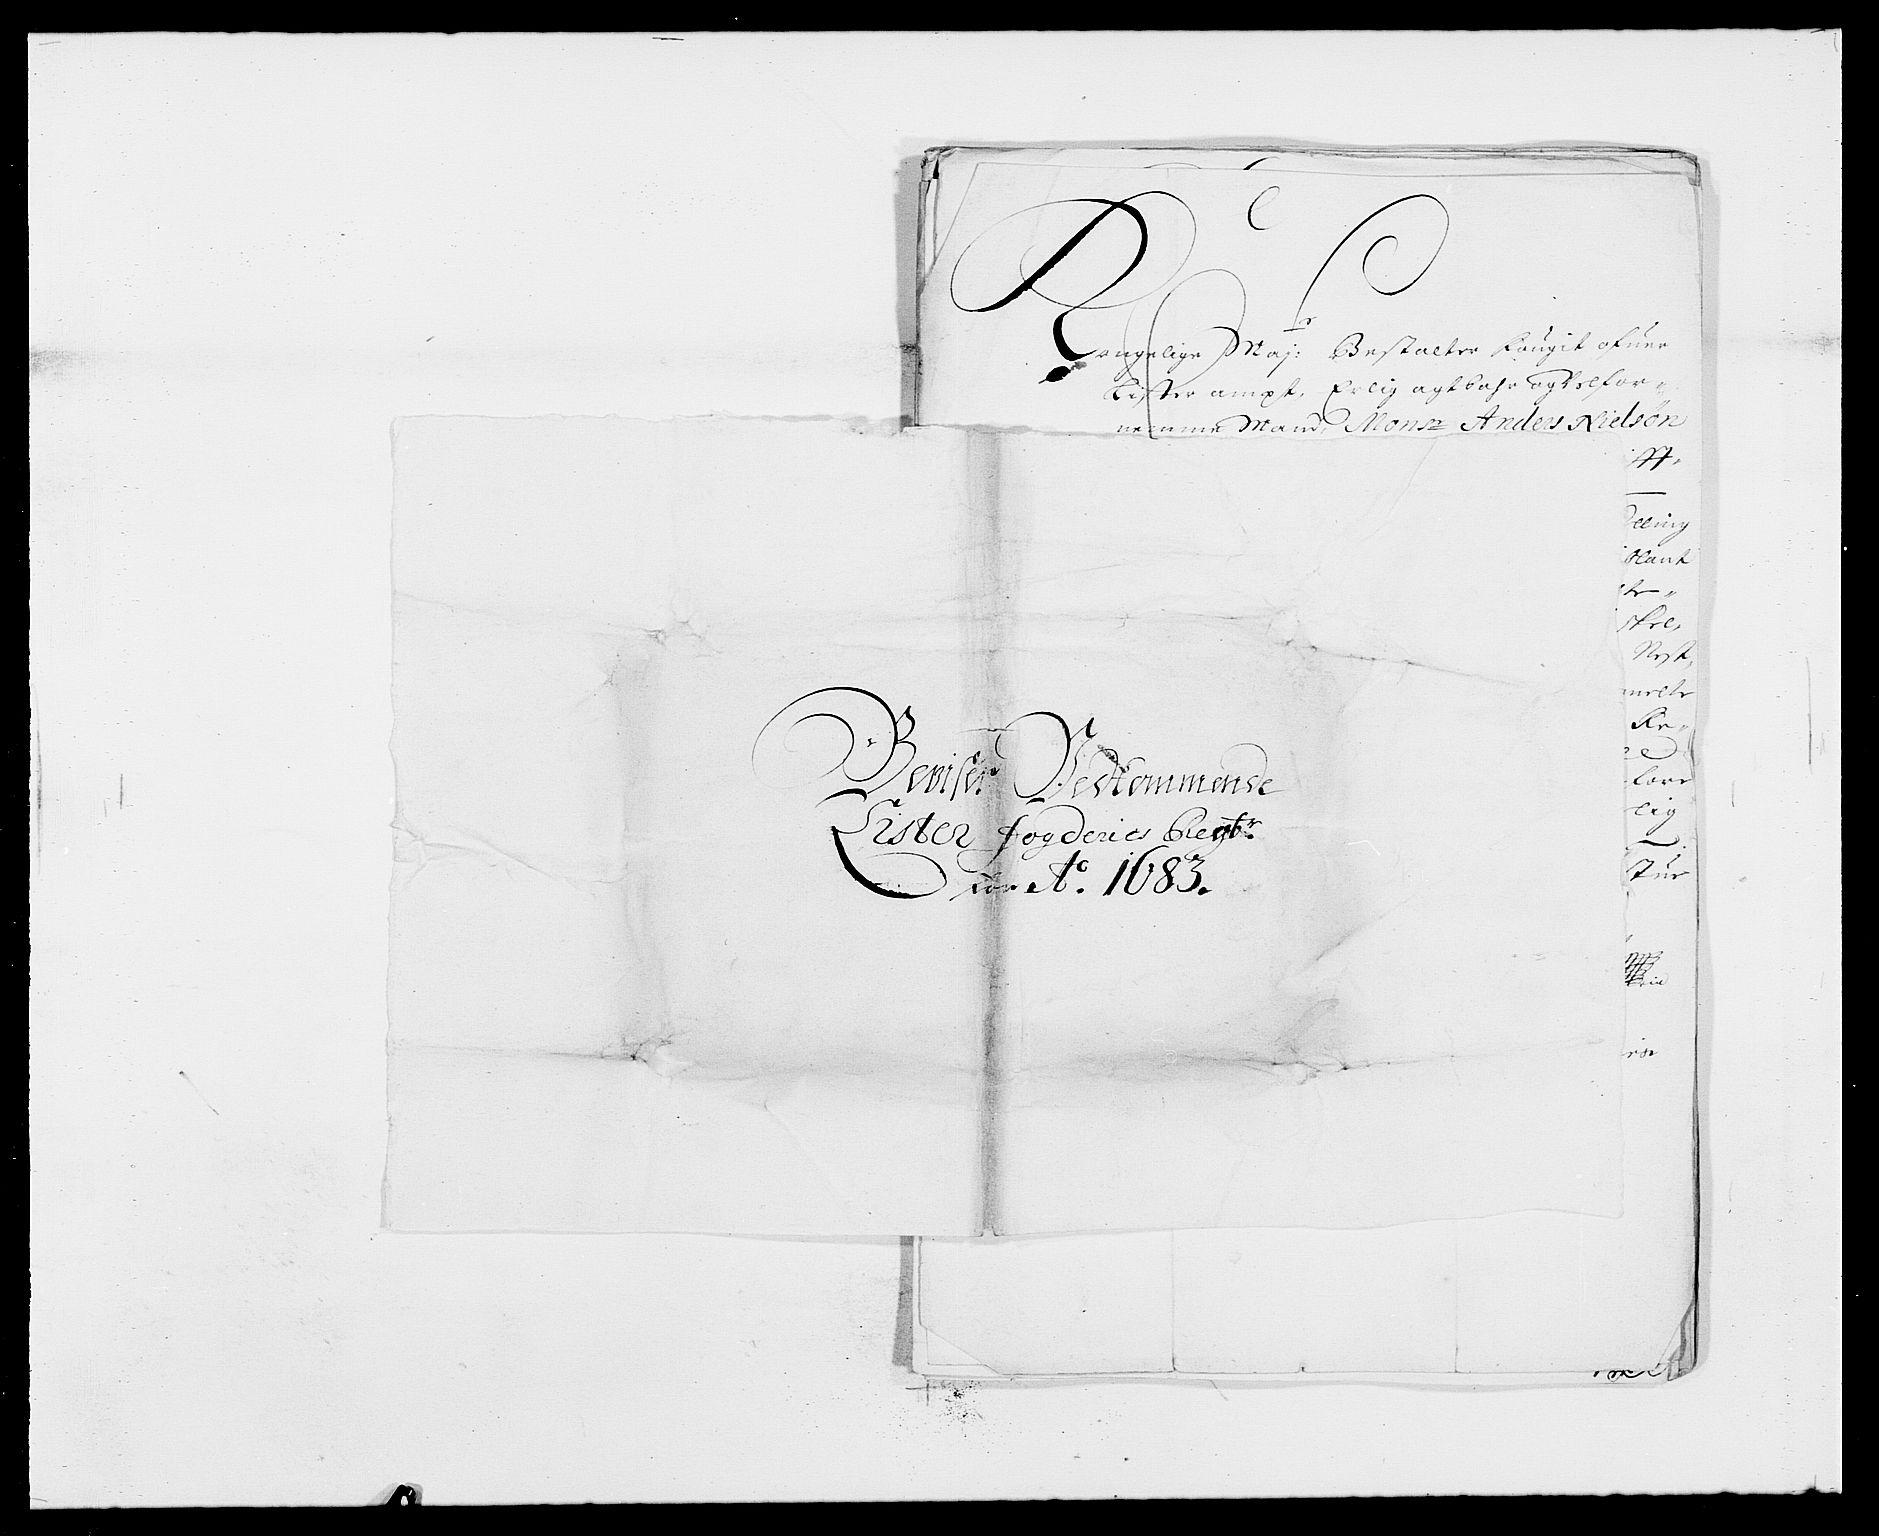 RA, Rentekammeret inntil 1814, Reviderte regnskaper, Fogderegnskap, R41/L2532: Fogderegnskap Lista, 1683, s. 171